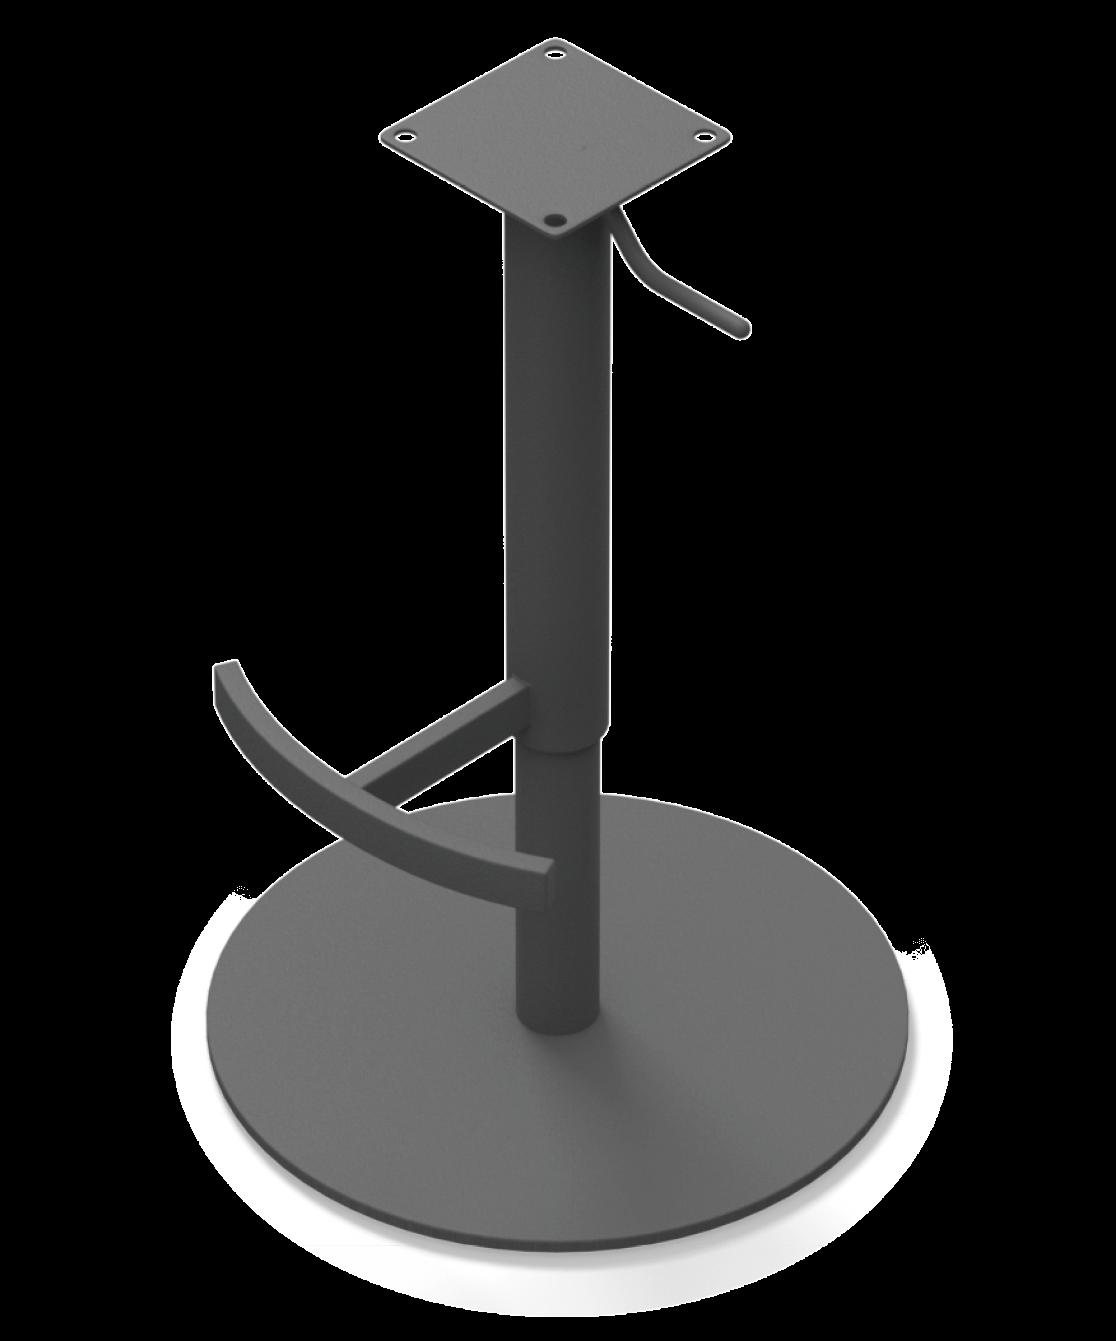 Sitzgestell Drehfuß